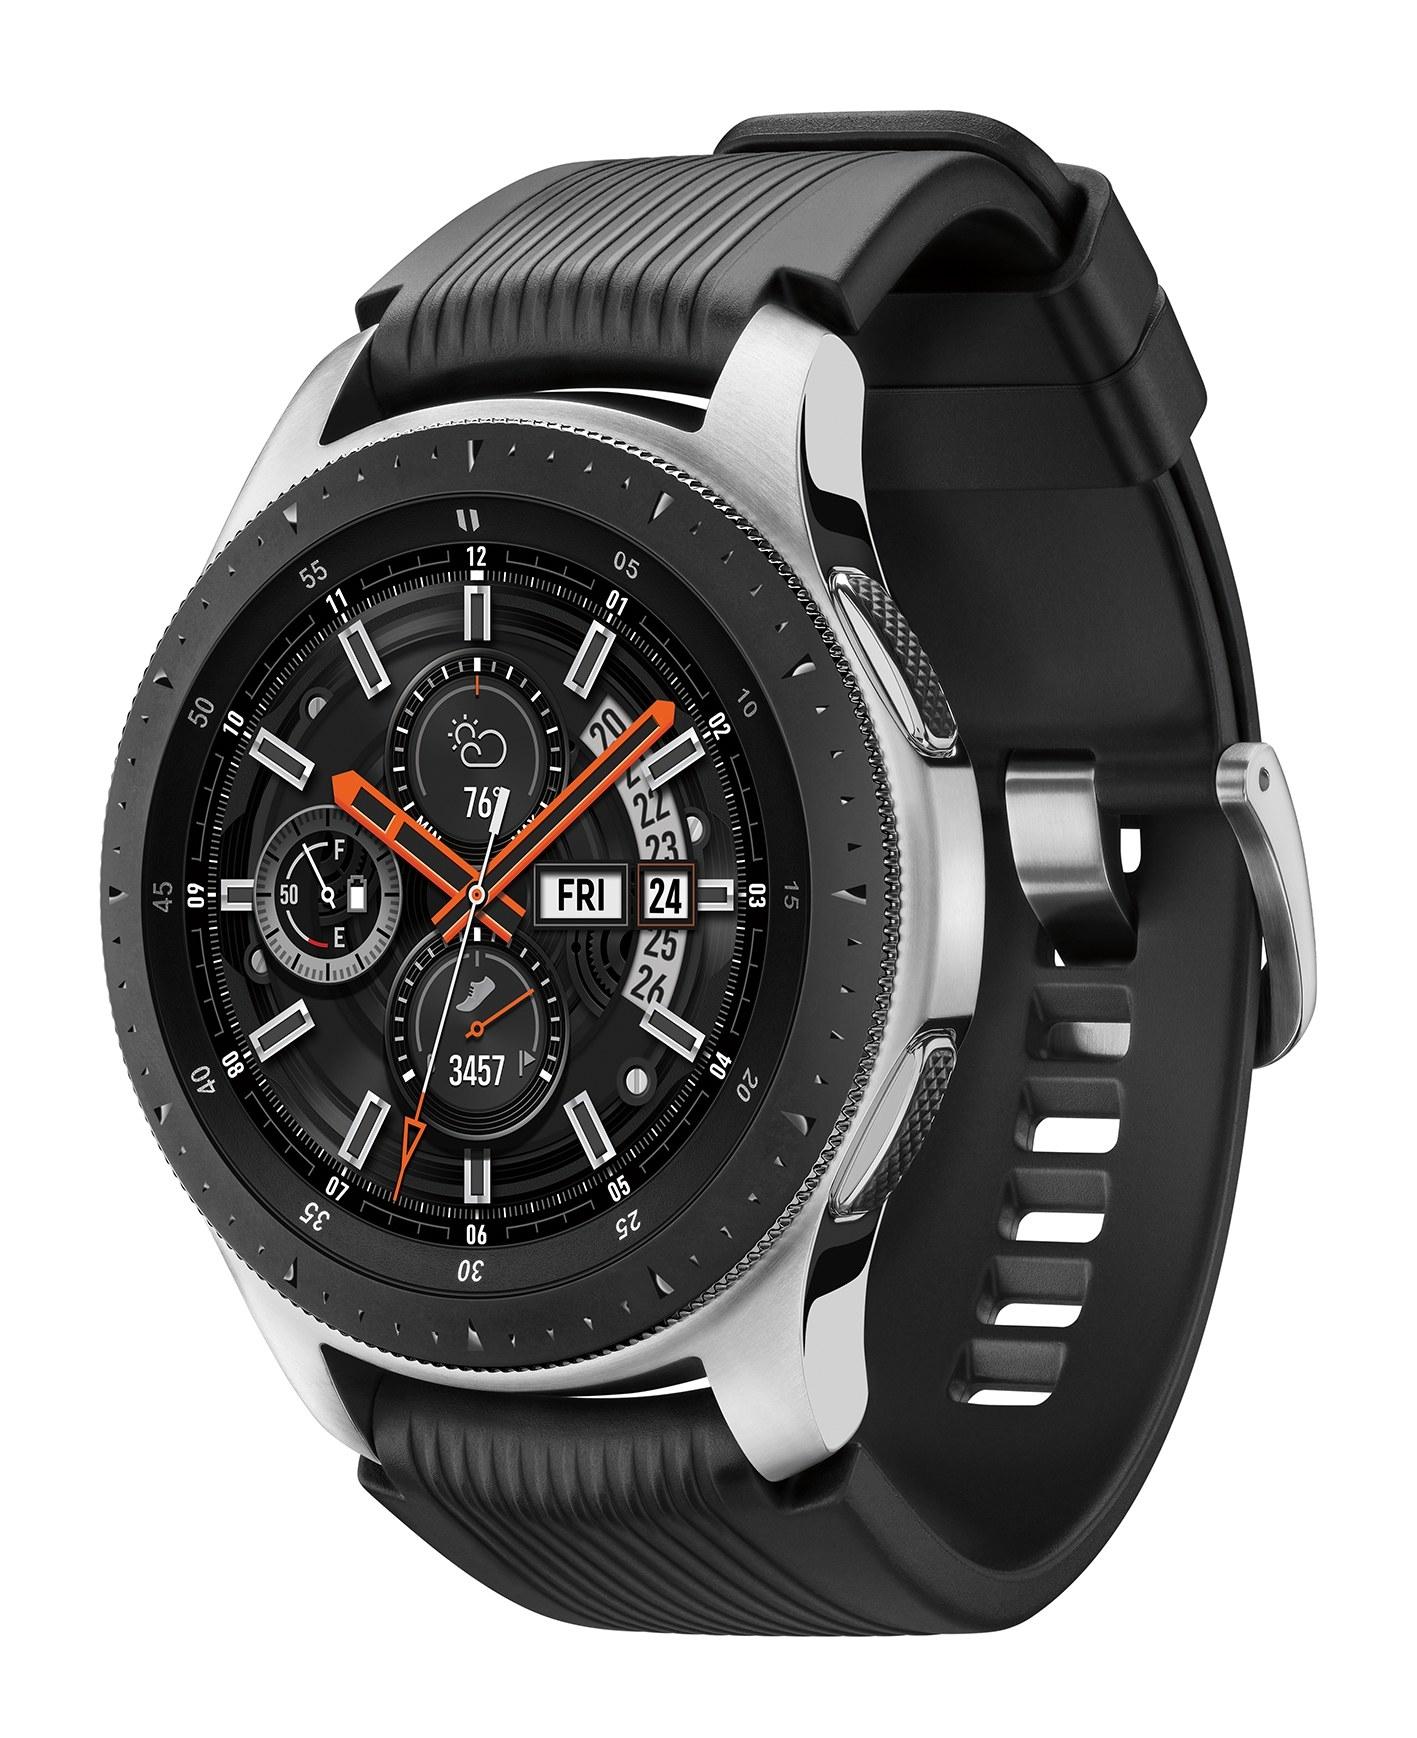 a black samsung galaxy smart watch with a sport band